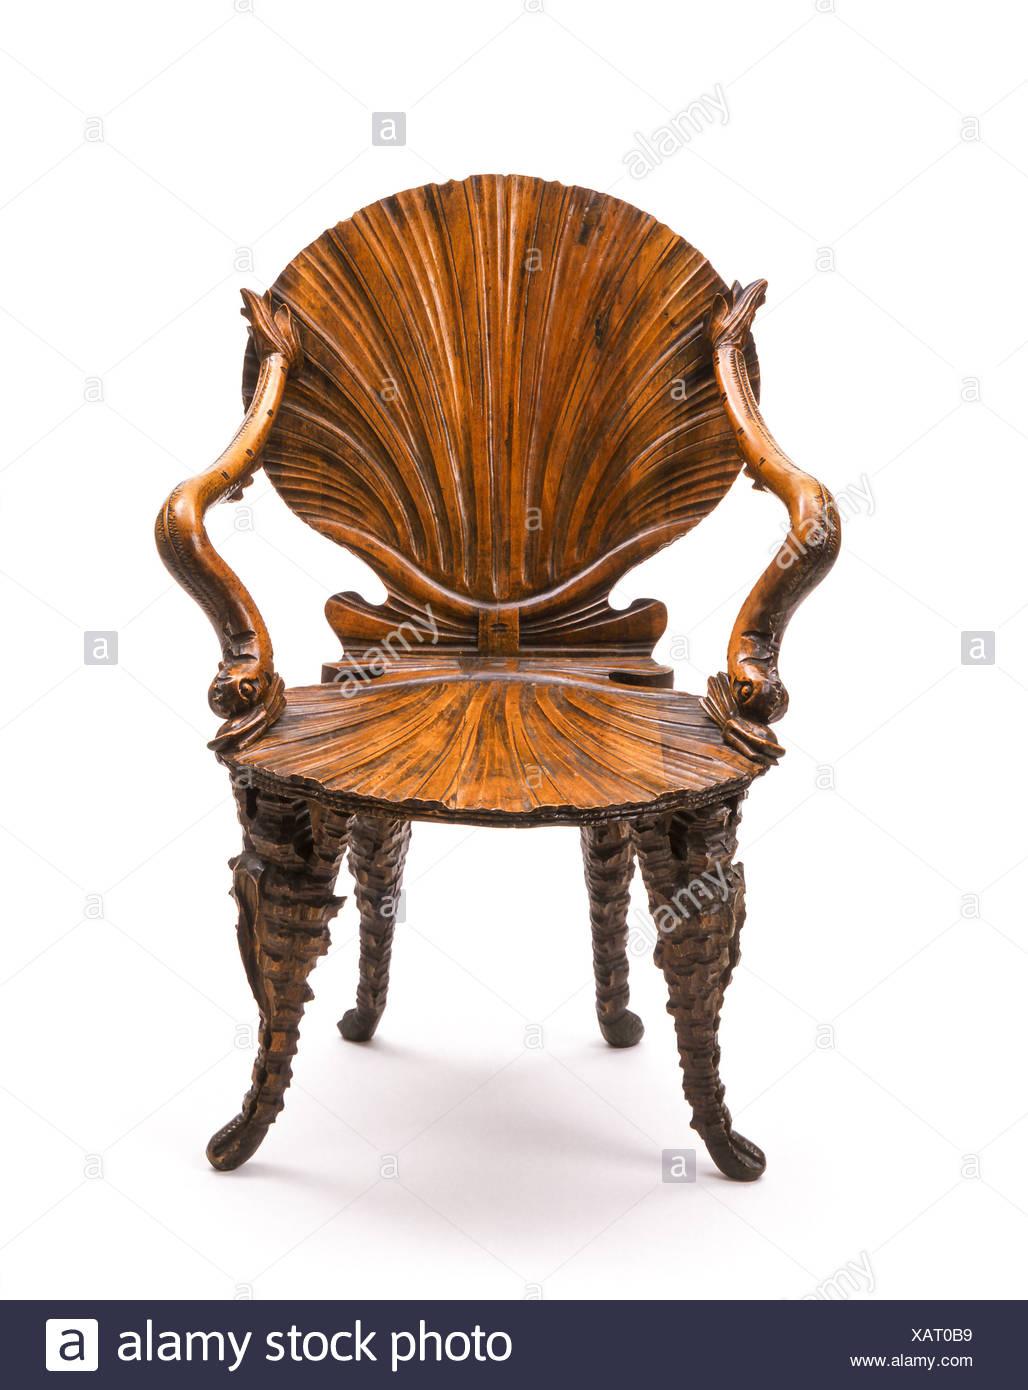 Alter Antiker Stuhl, Antiquitäten..Antique chair..Old, Chair, Antique,  Antiques, Ancient, Furniture, Nobody, Seat, Rarity - Alter Antiker Stuhl, Antiquitäten..Antique Chair..Old, Chair